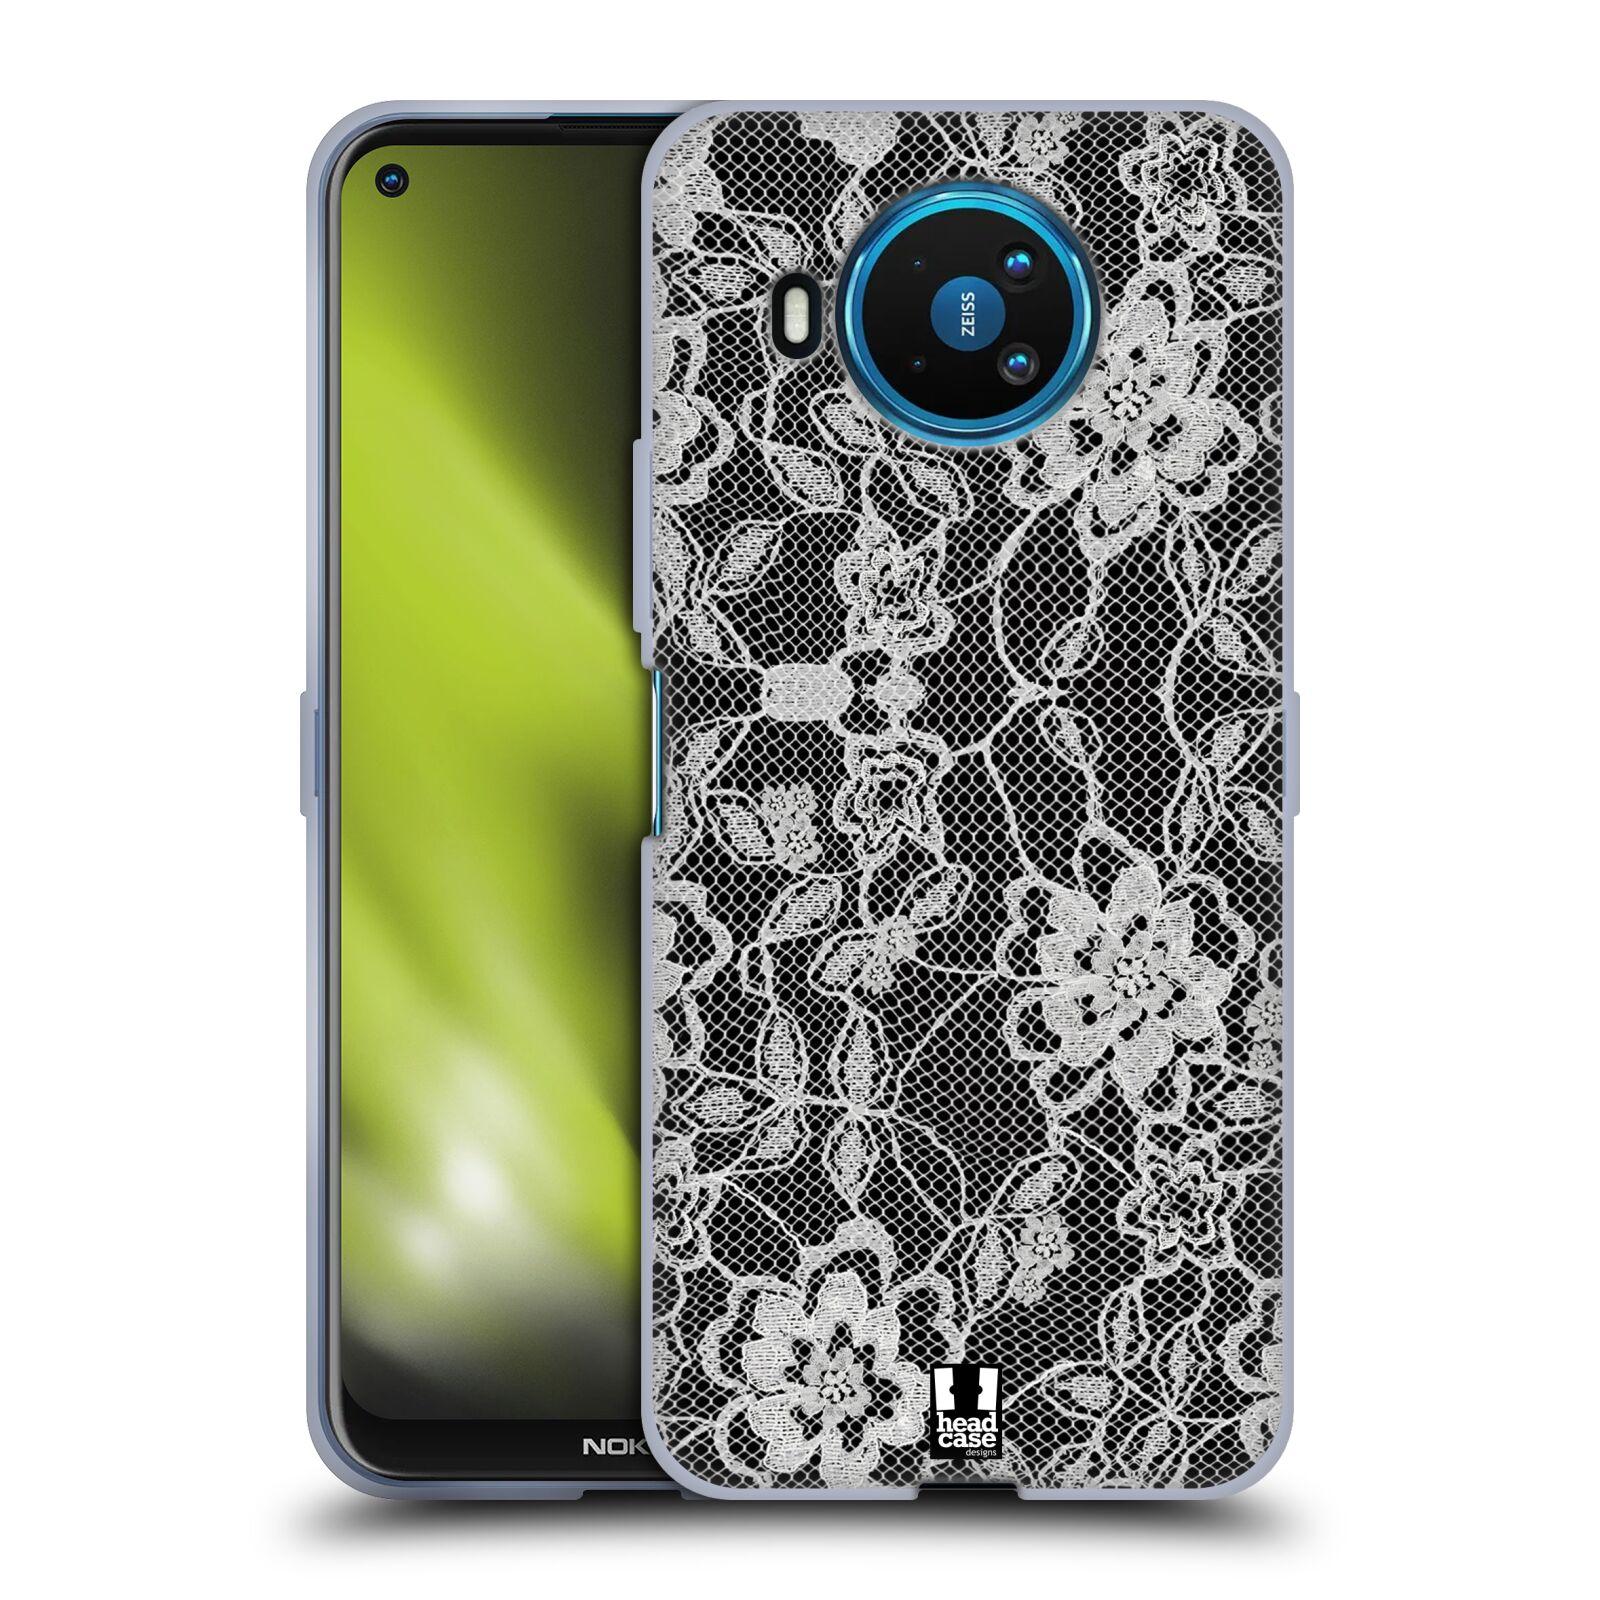 Silikonové pouzdro na mobil Nokia 8.3 5G - Head Case - FLOWERY KRAJKA